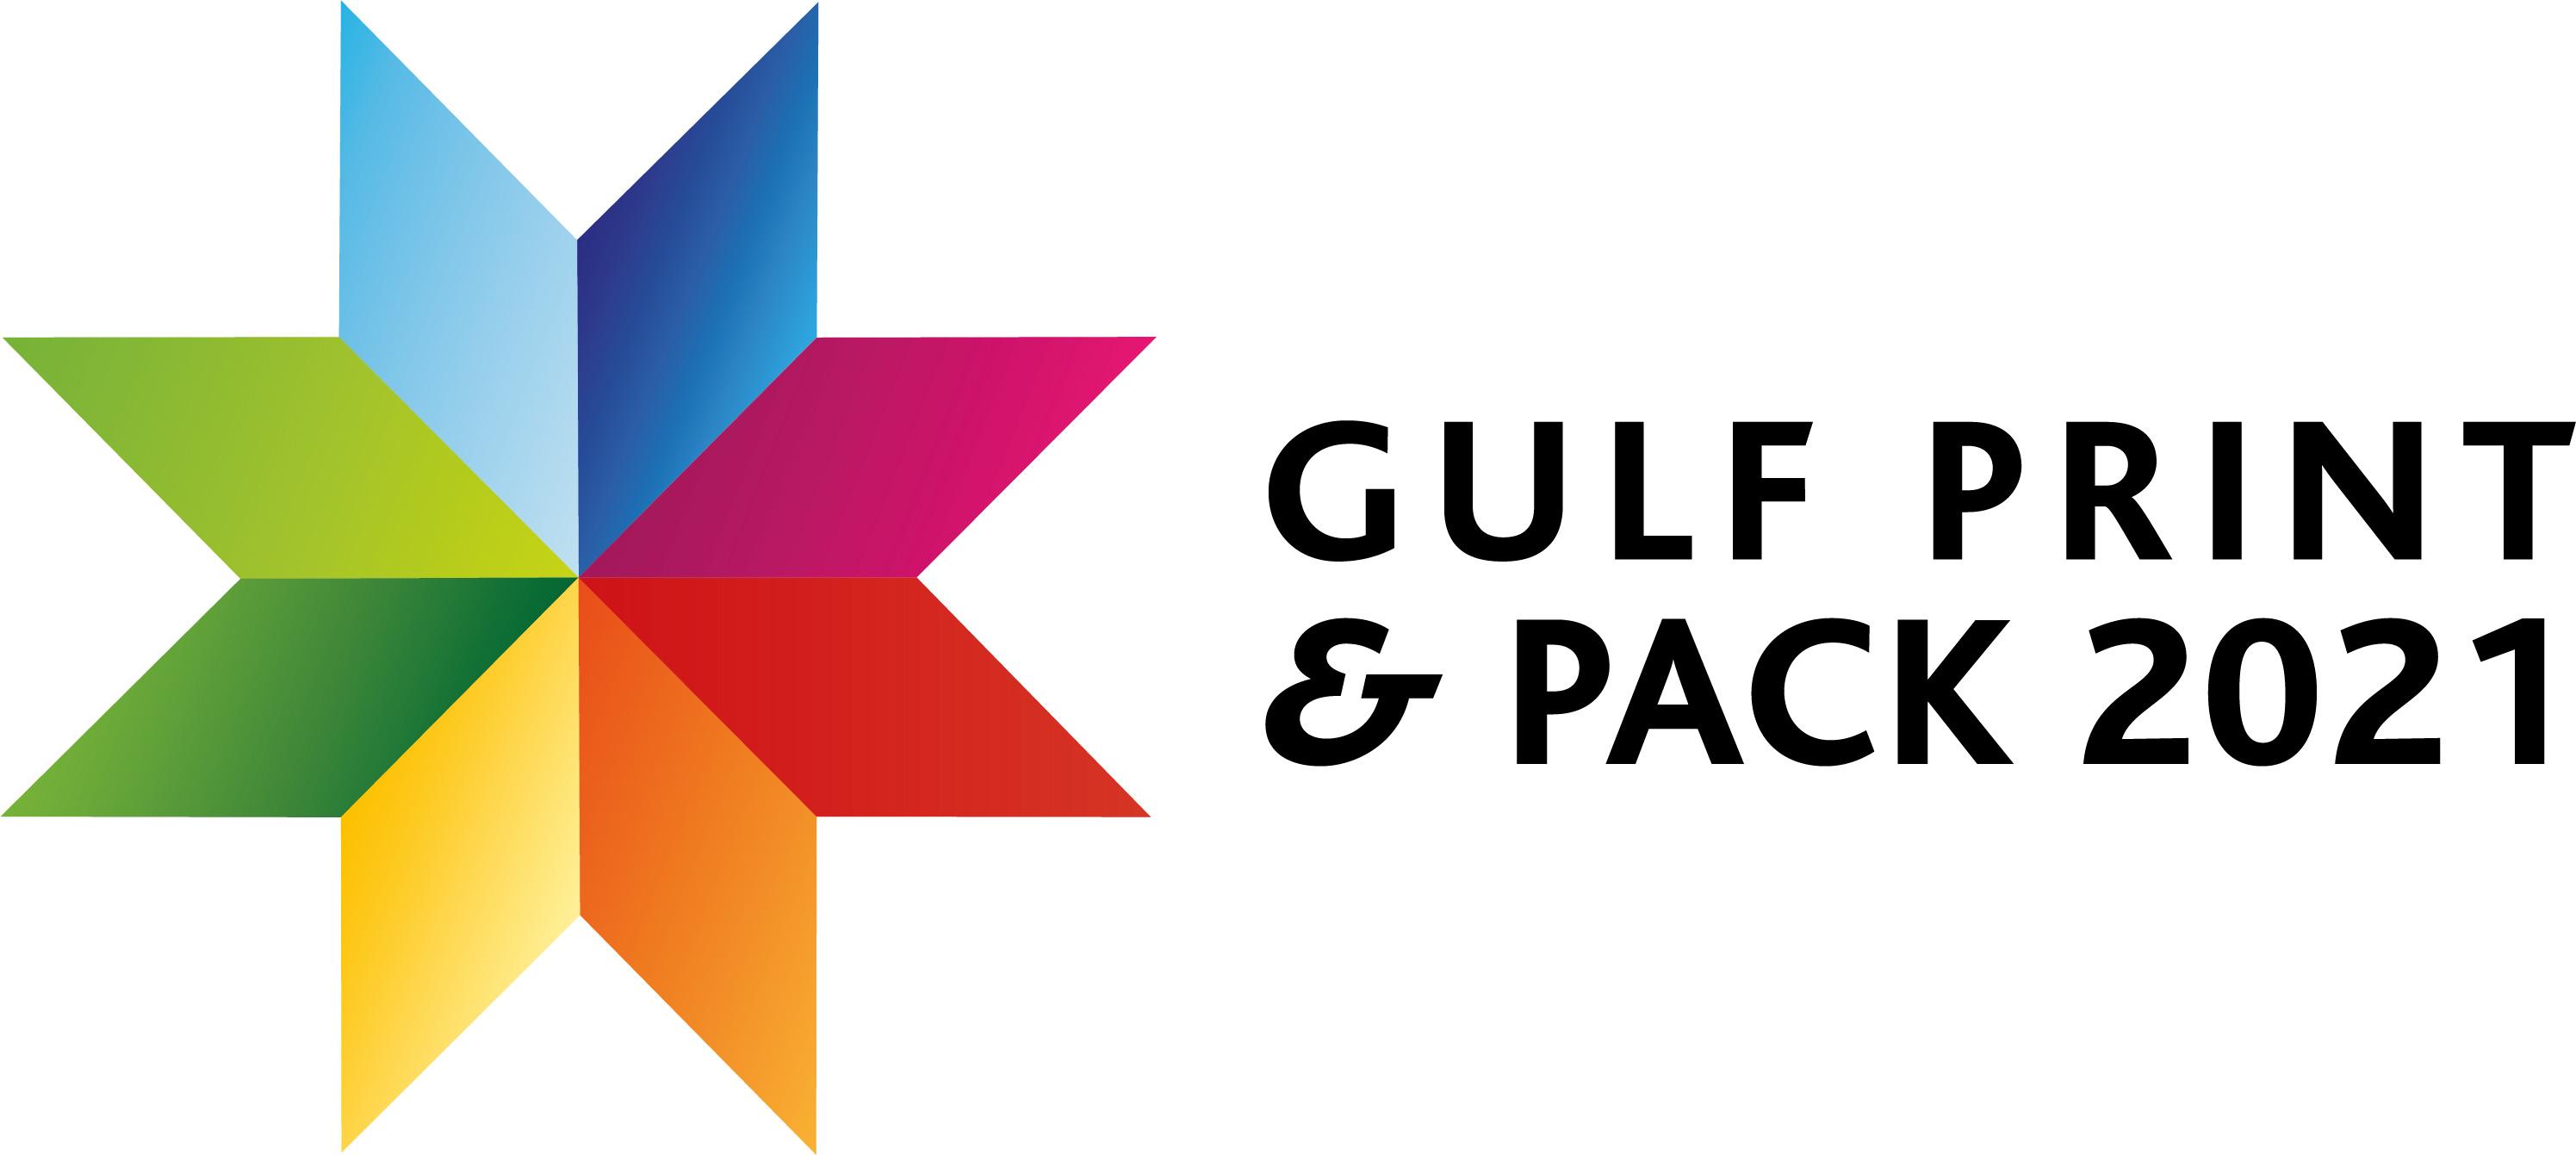 Gulf Print & Pack 2021 logo